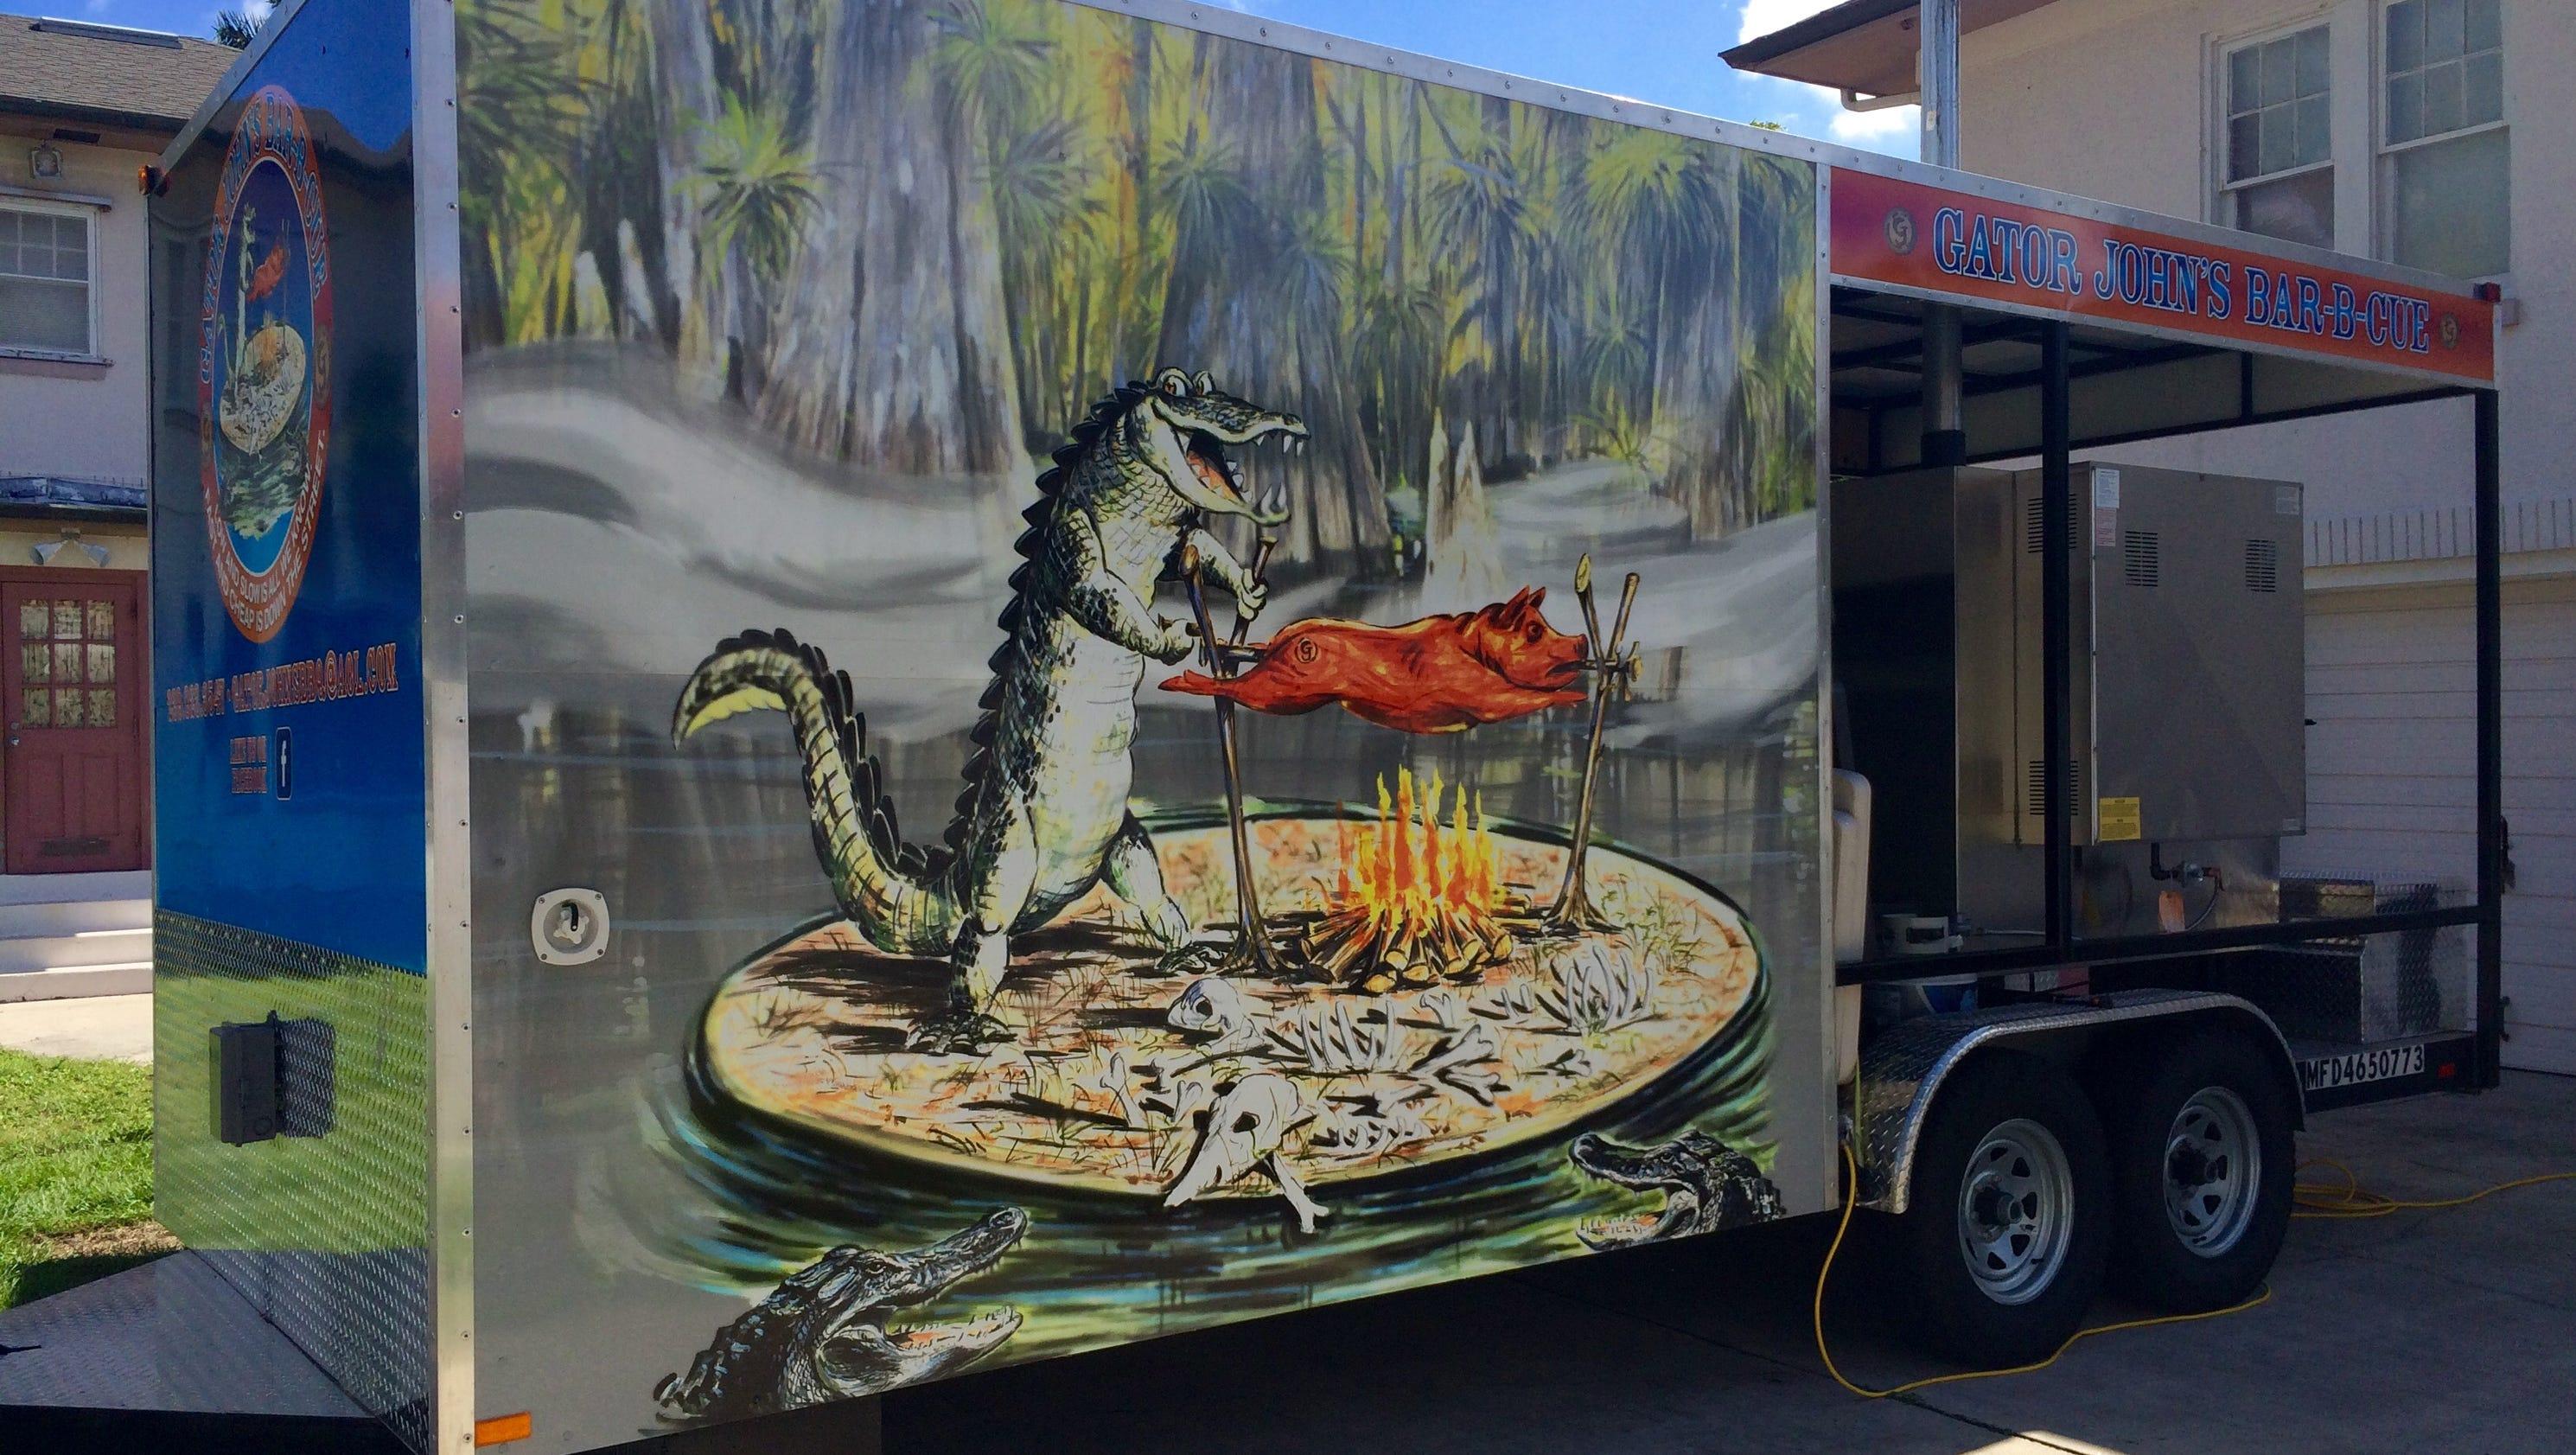 Firefly S Bbq Food Truck